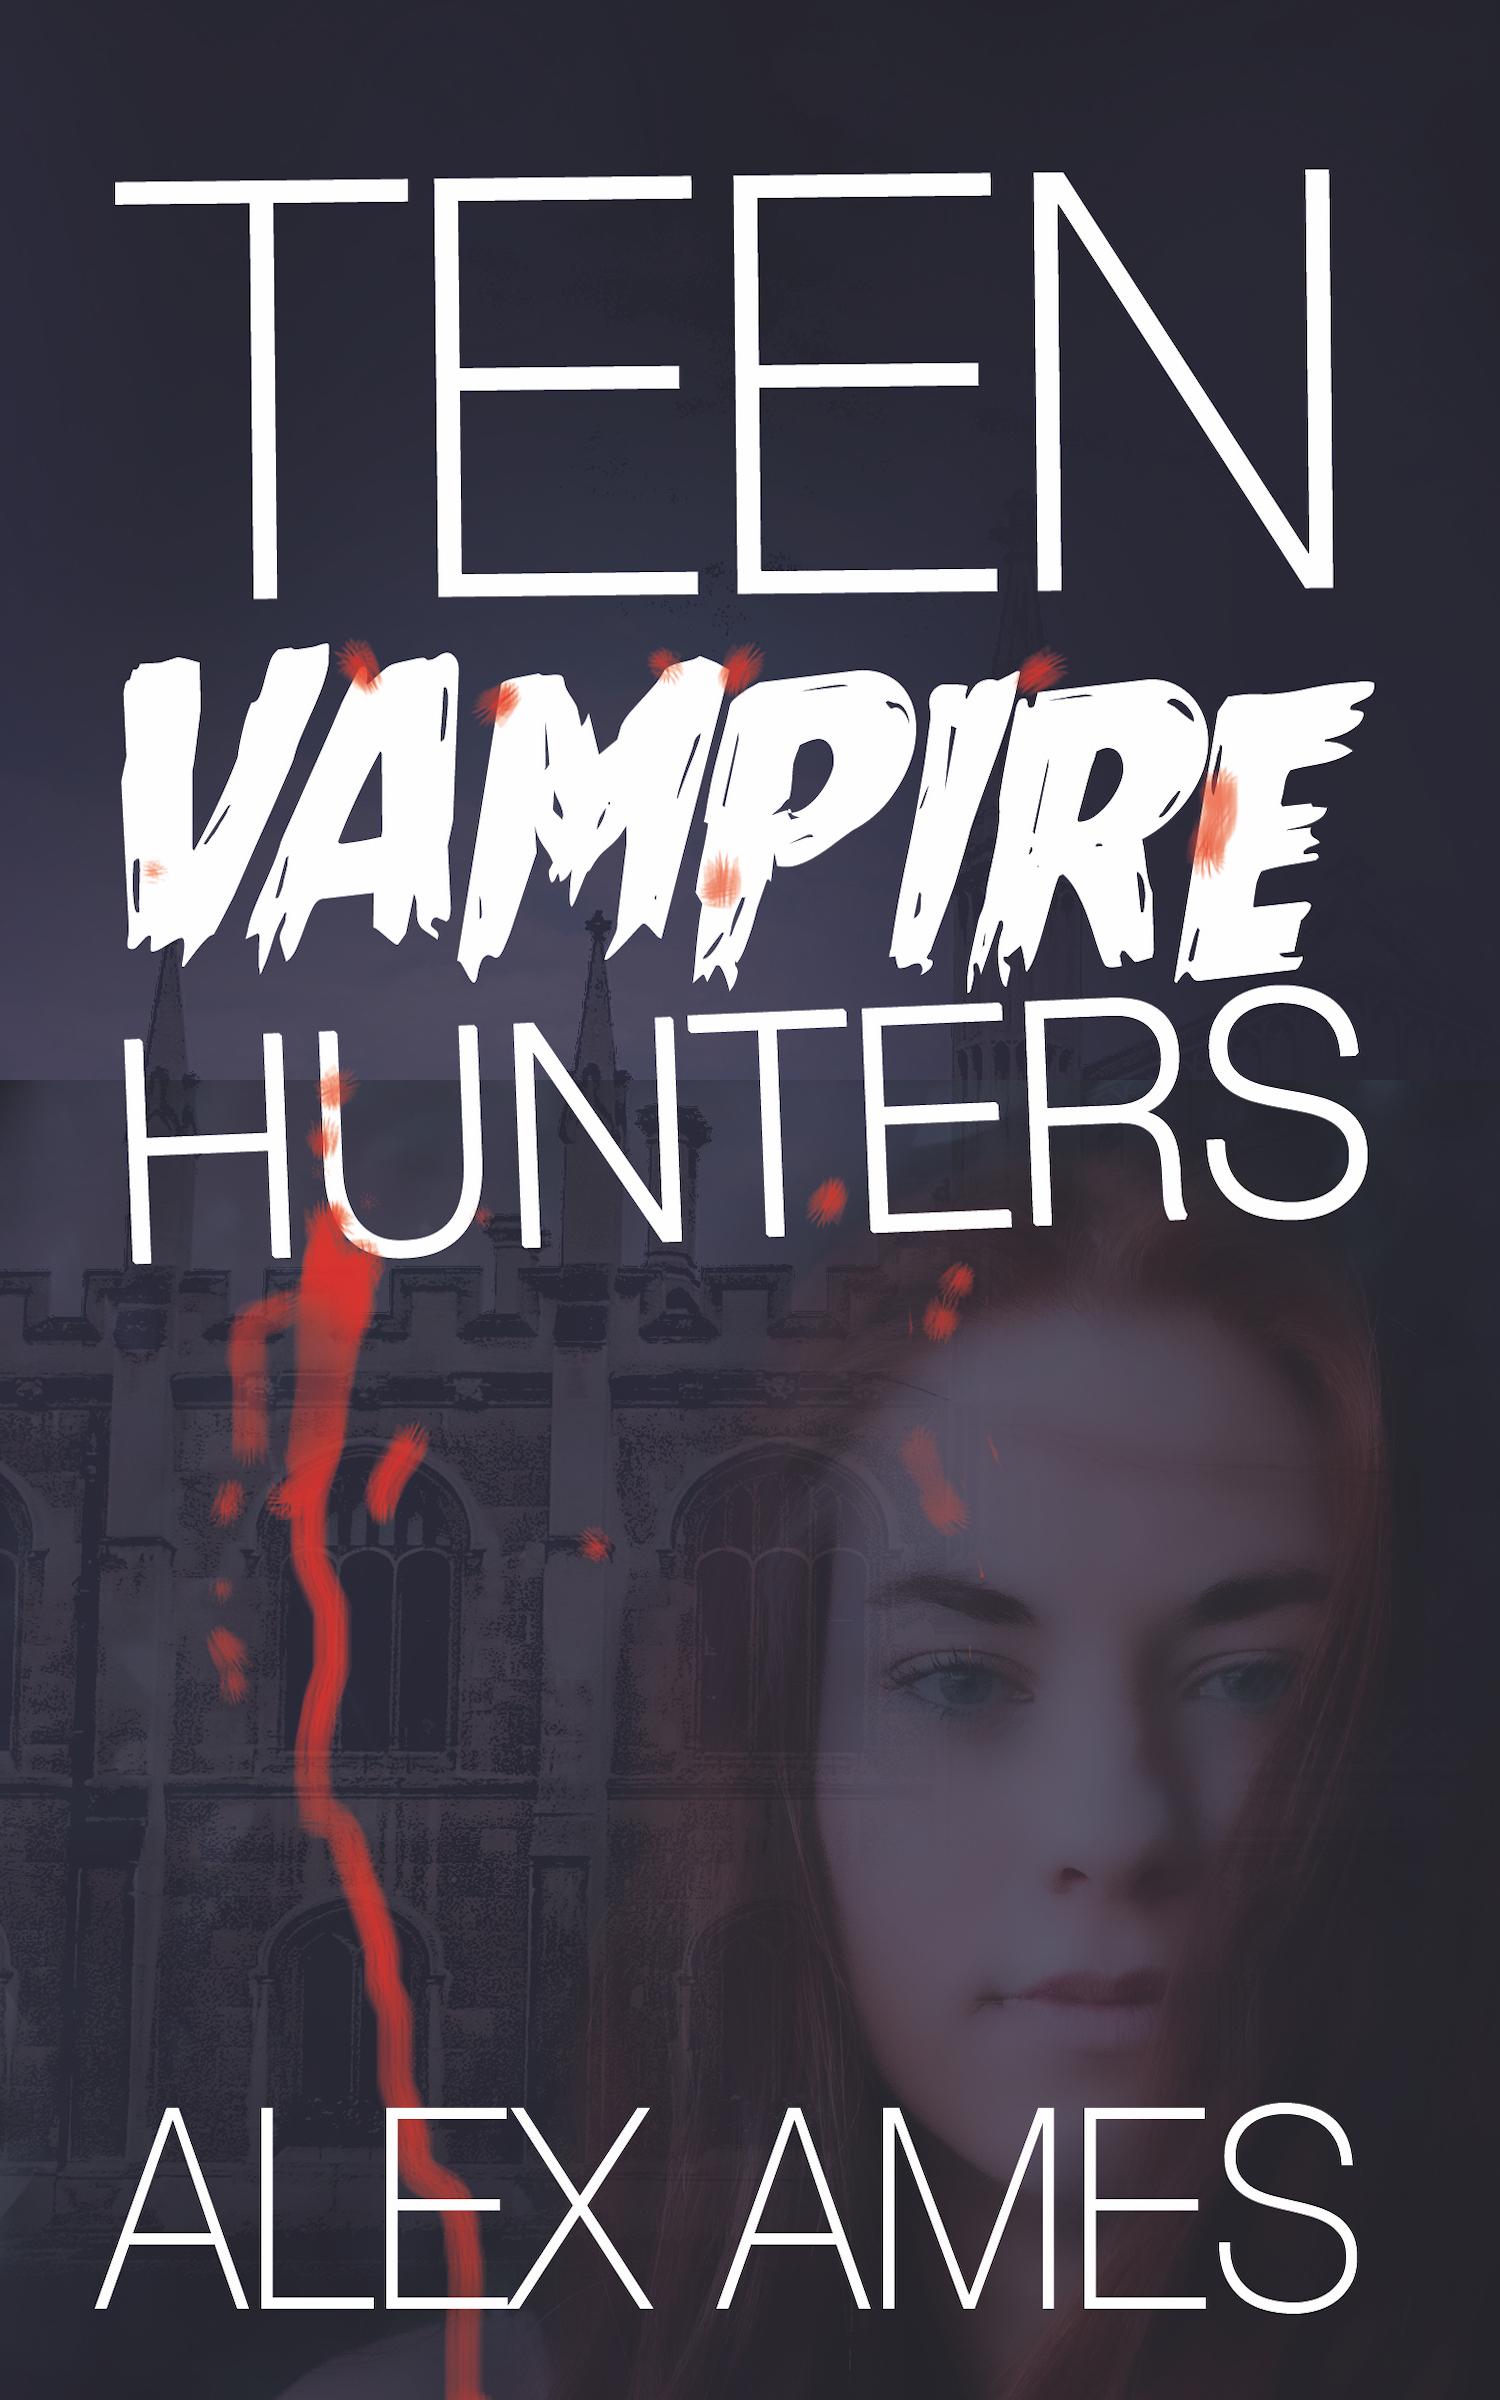 Teen Vampire Hunters